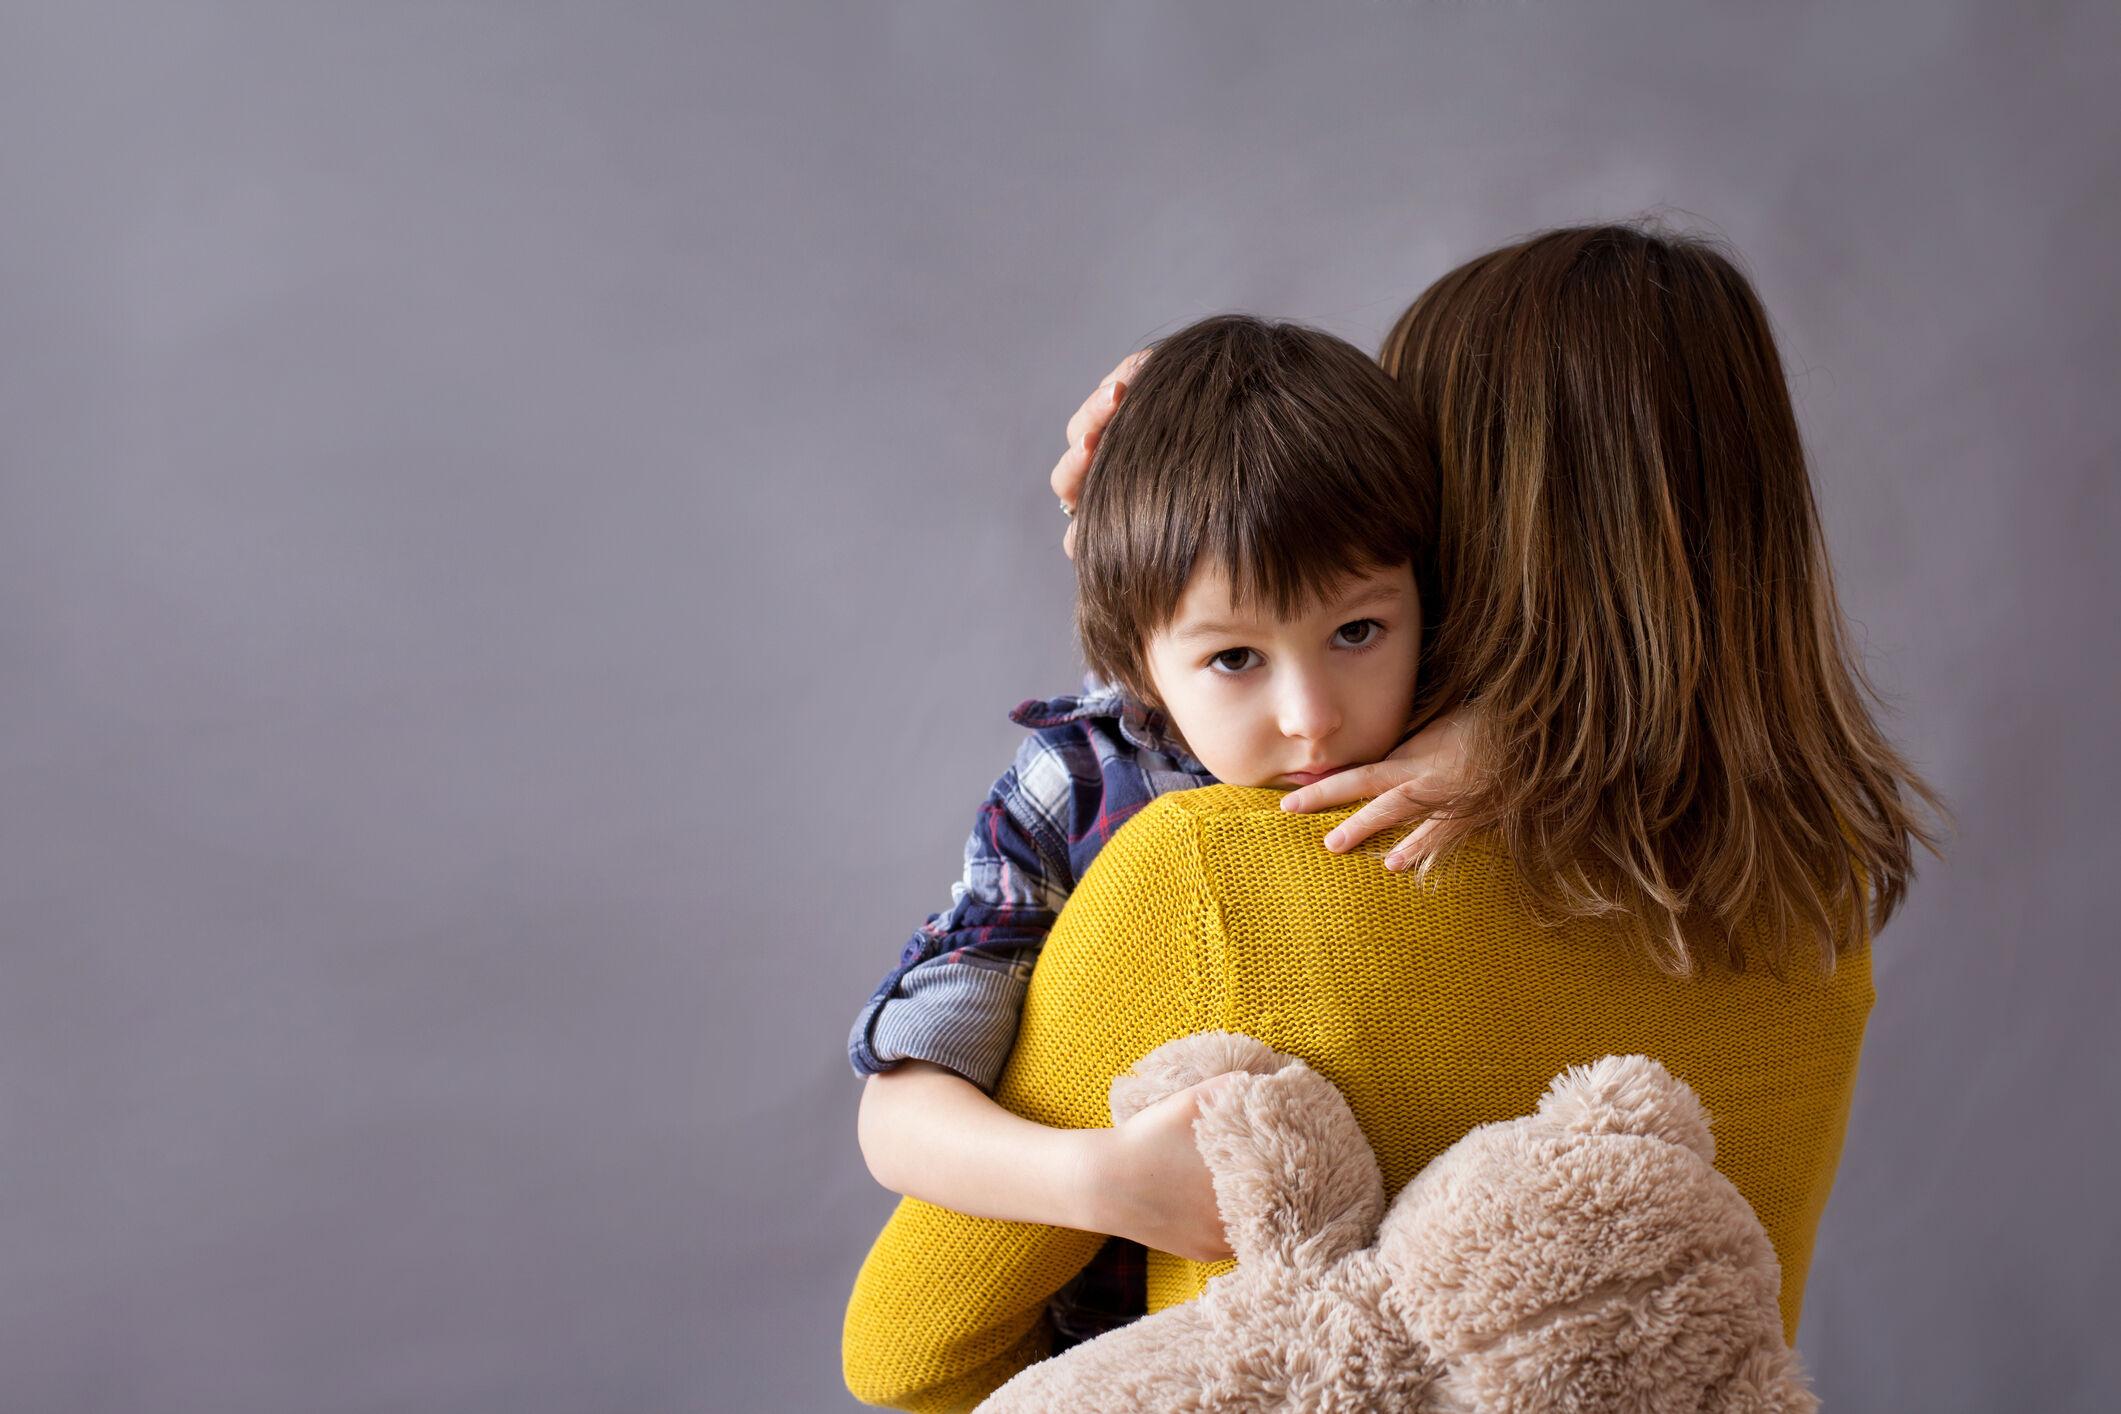 Menino abraçando a mãe – abandono paterno